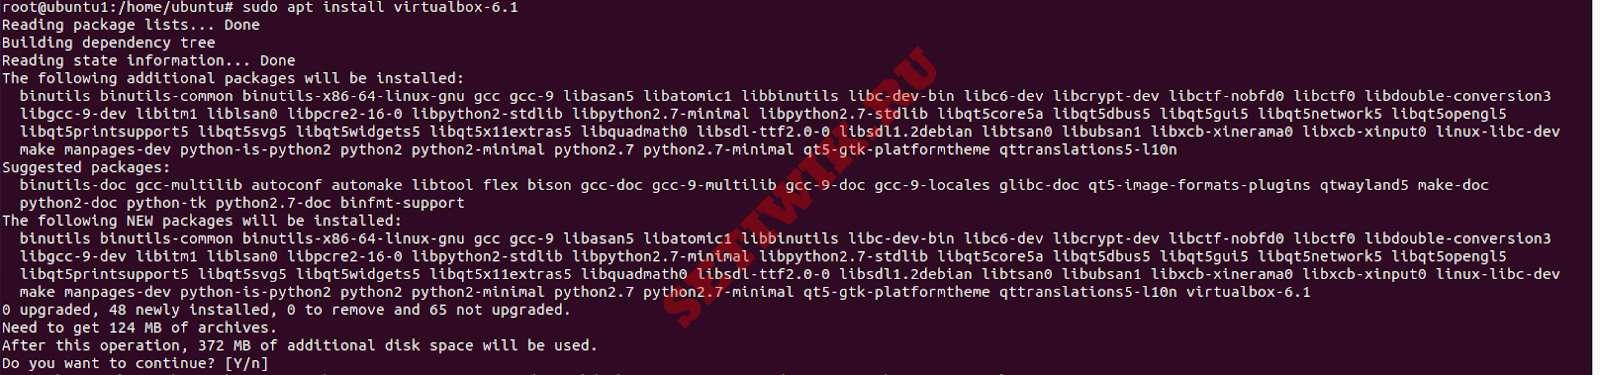 Установите VirtualBox 6.1 на Ubuntu